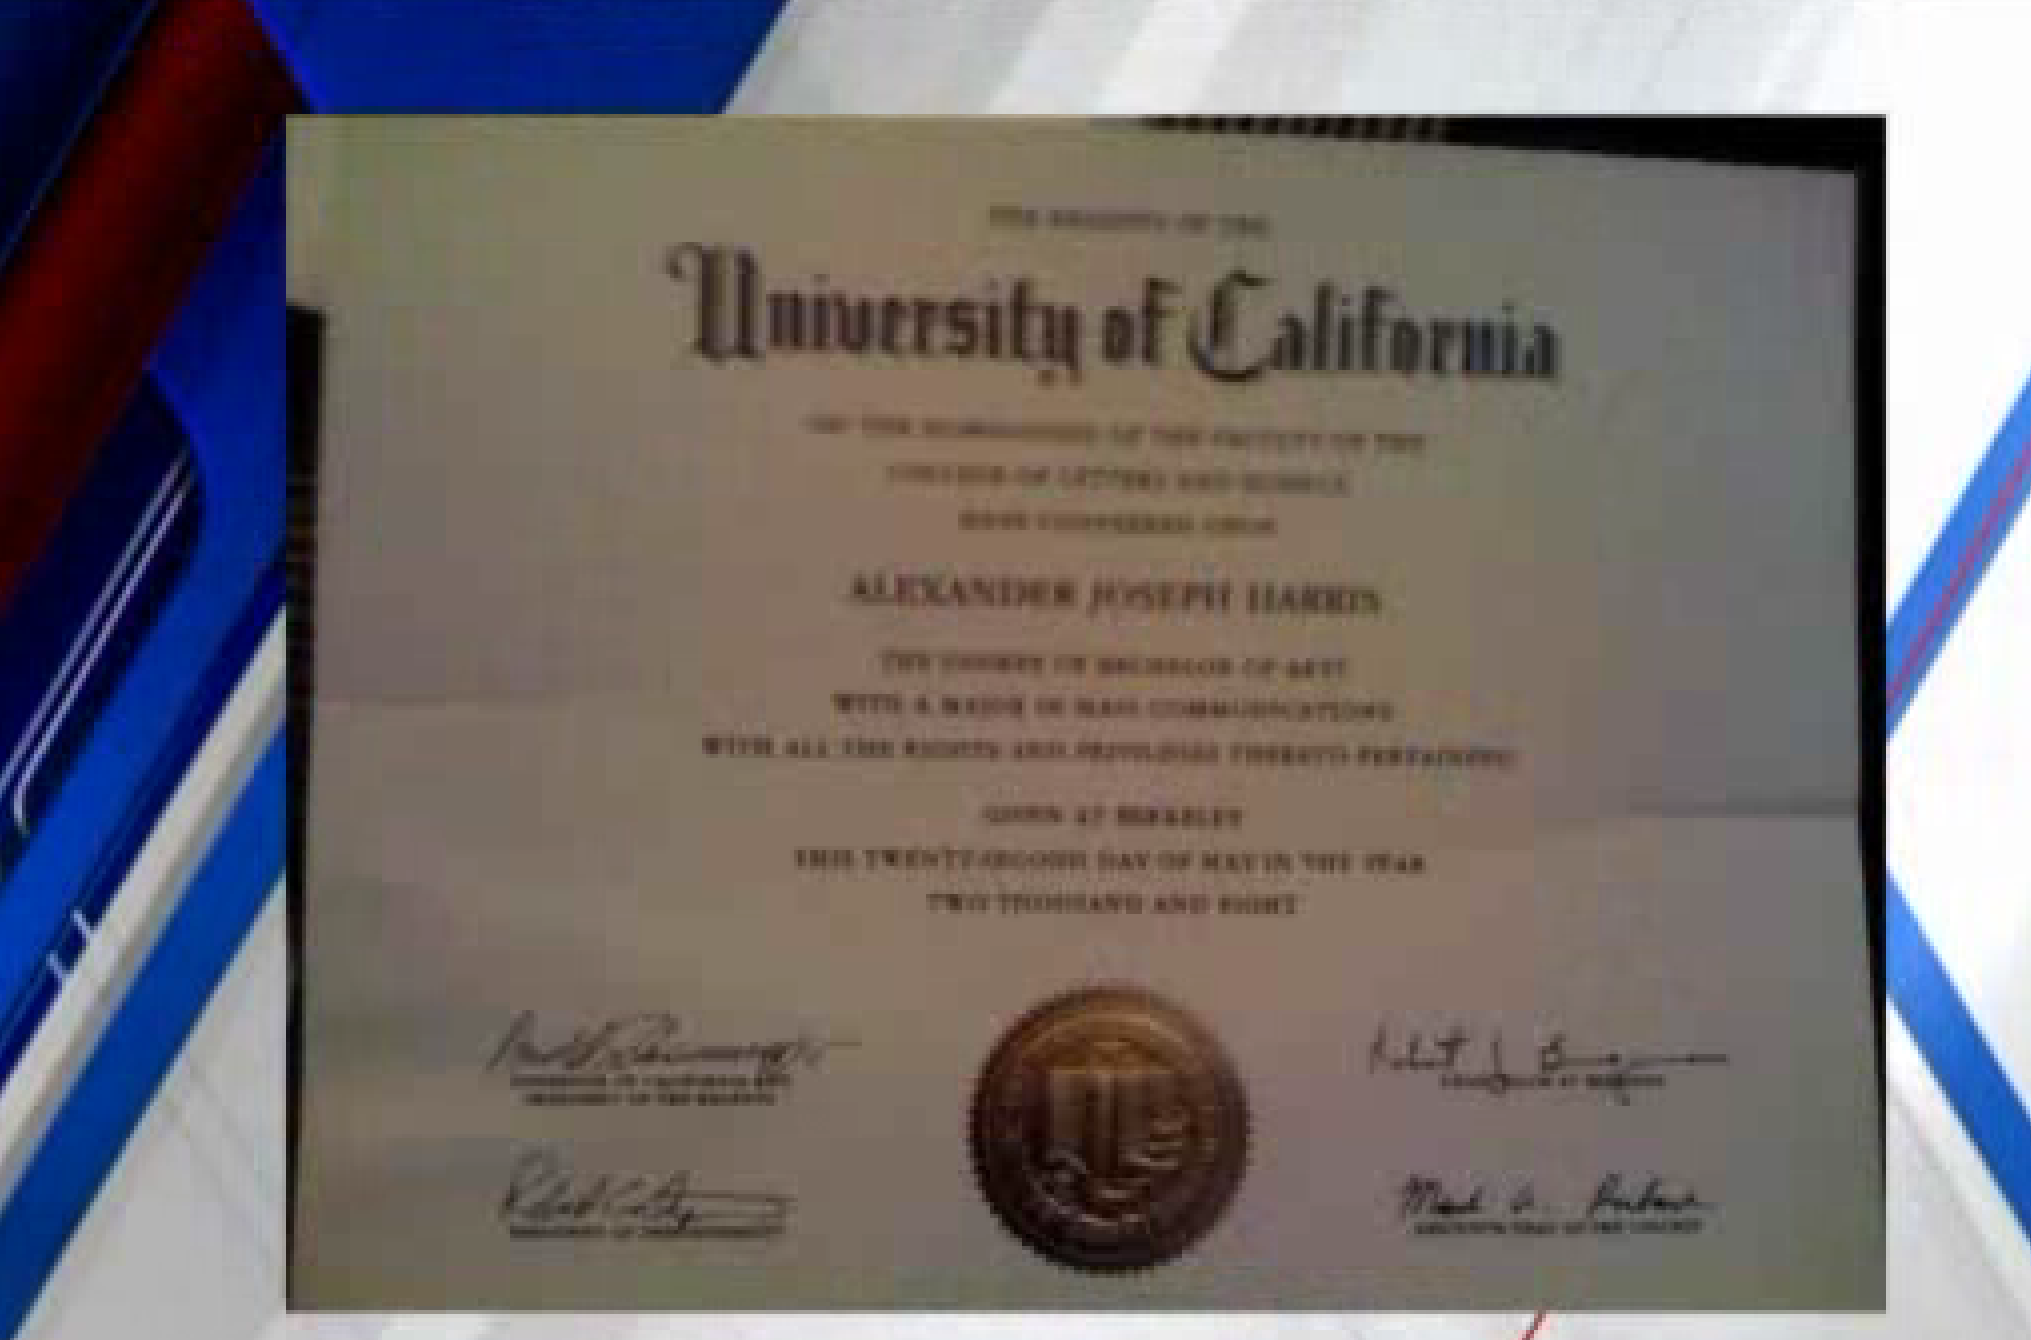 Typo On Uc Berkeley Diploma Goes Viral Chicago Tribune